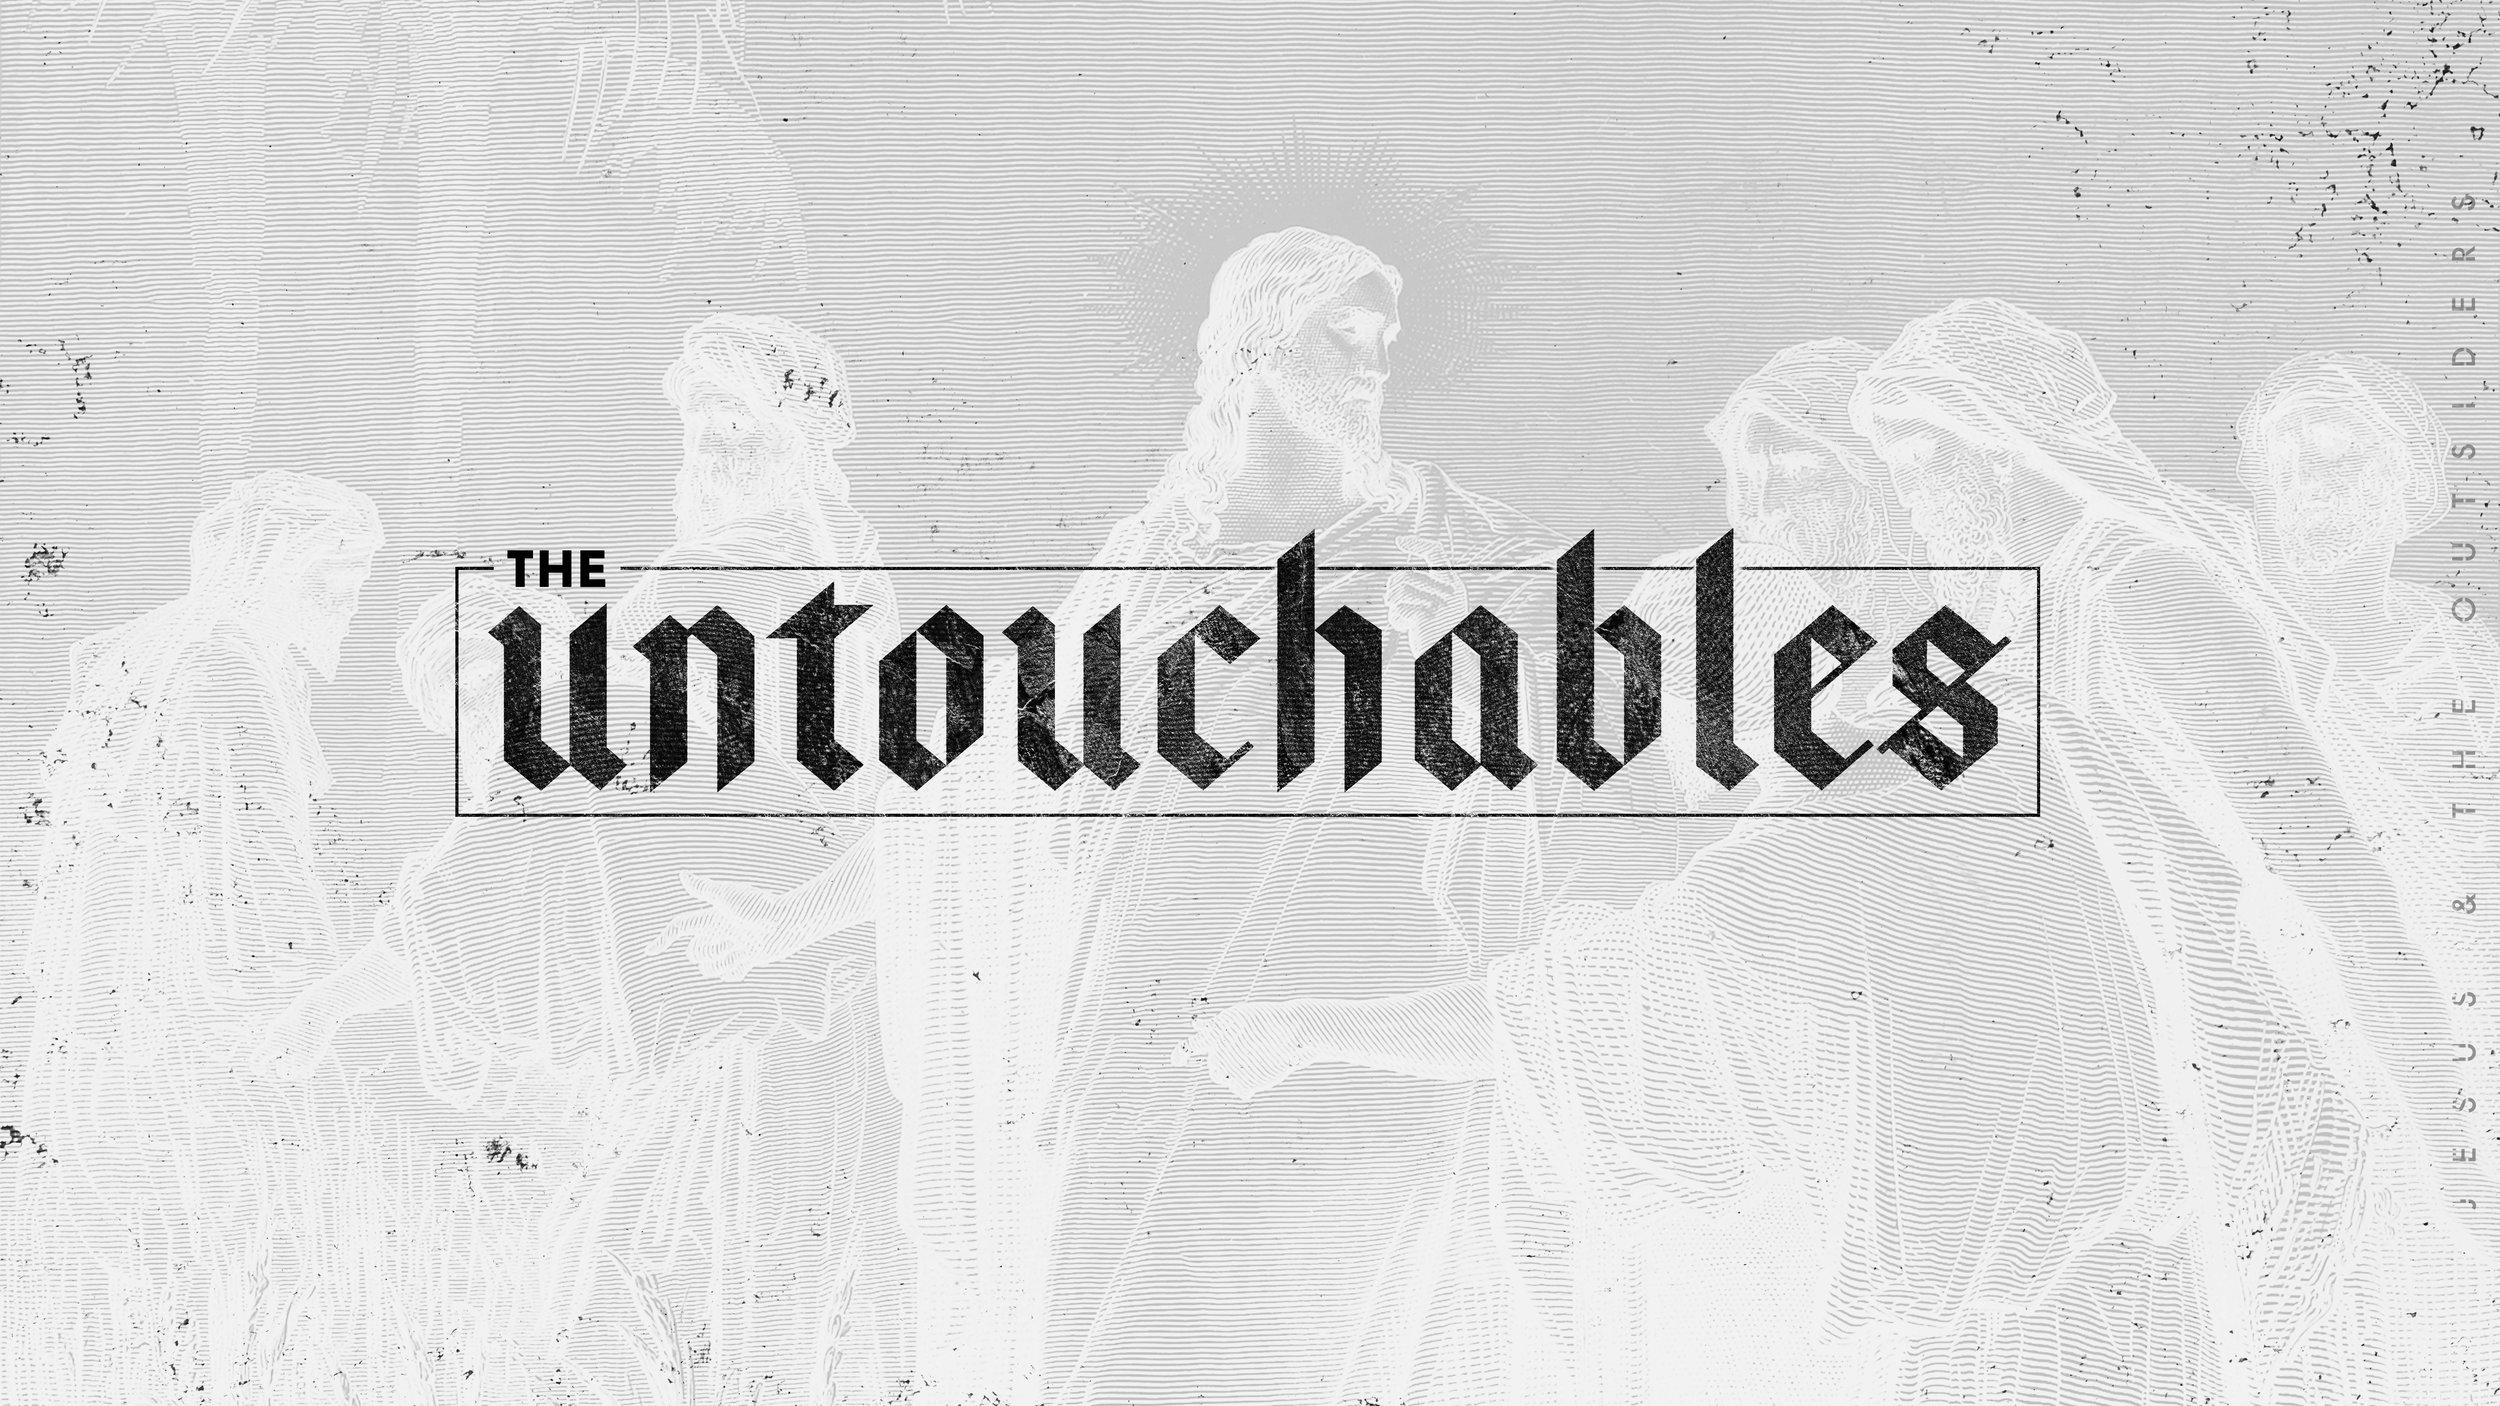 Title_TheUntouchables_Curriculum_Grow.jpg